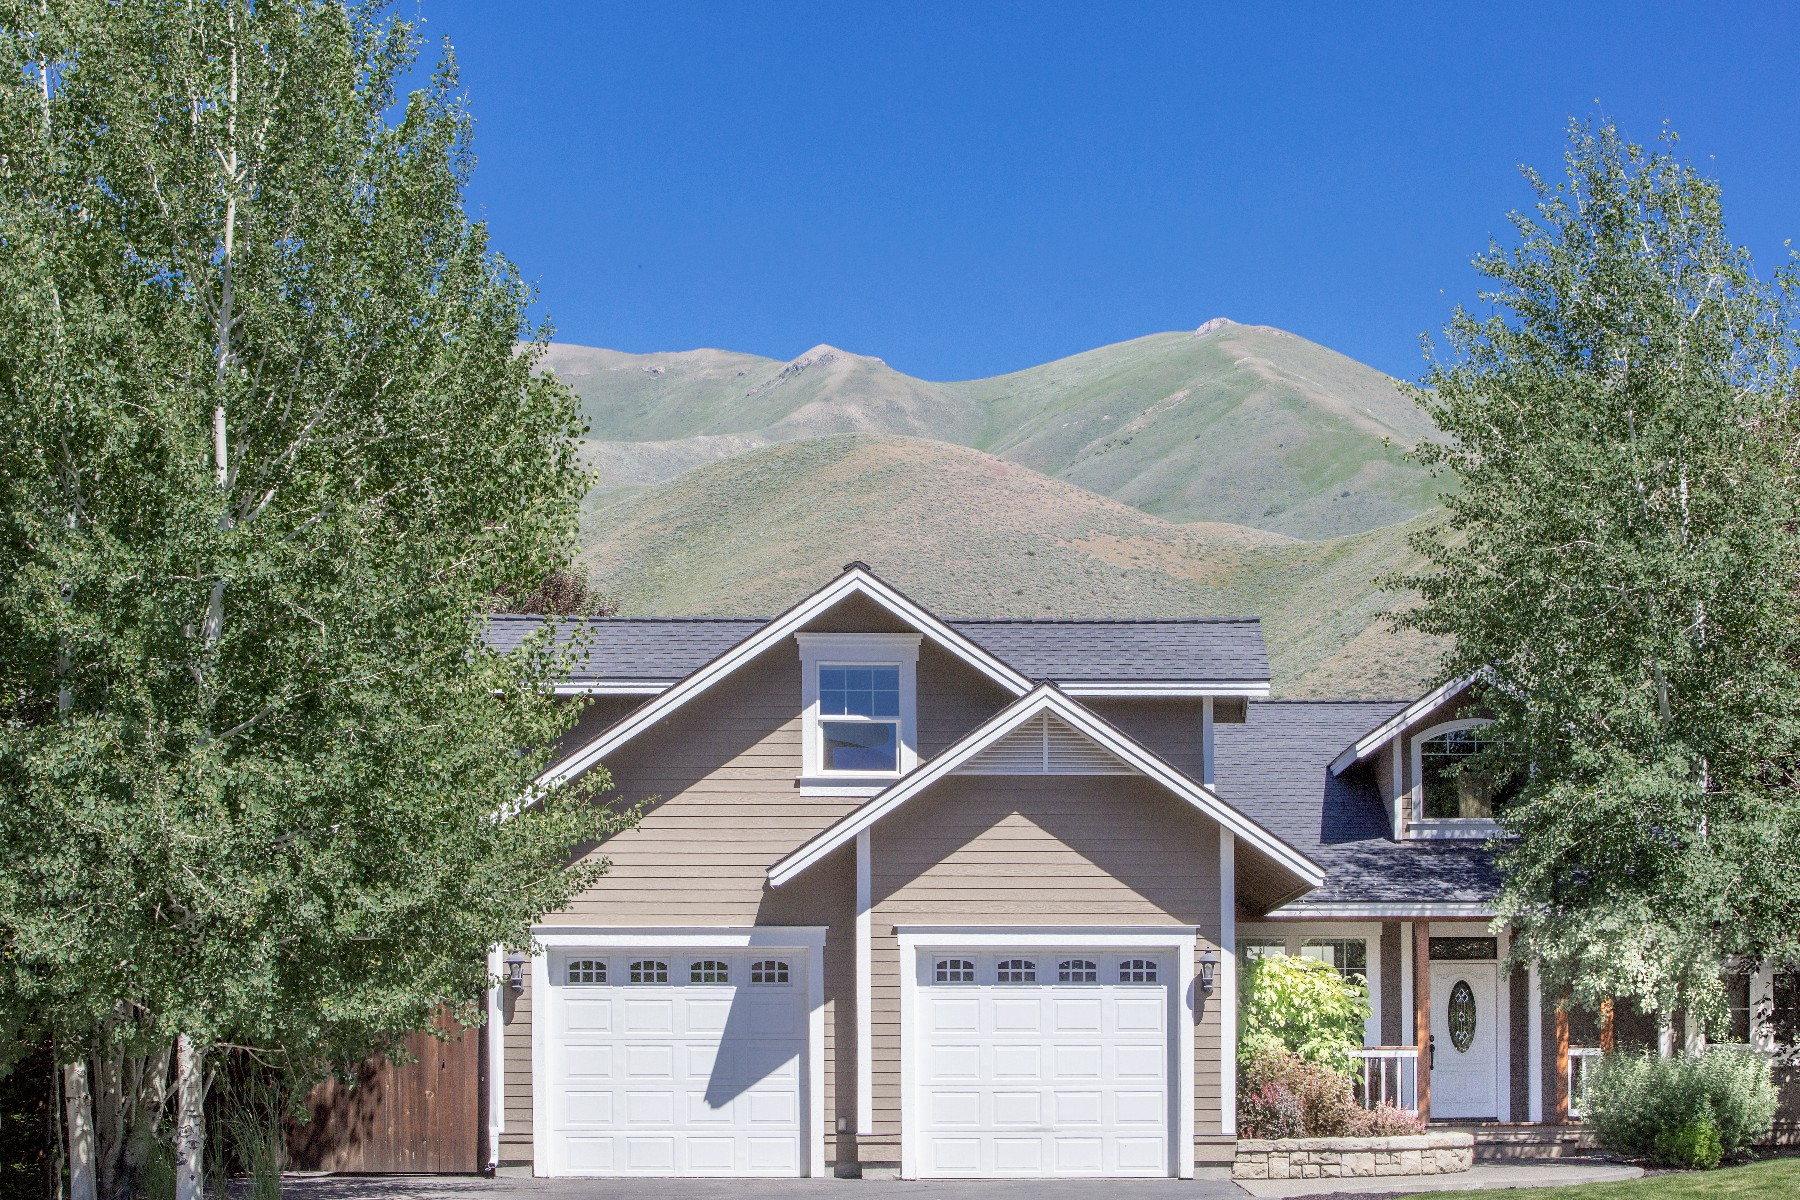 Moradia para Venda às Fine Craftsmanship with lots of style 760 Eastridge Dr Hailey, Idaho, 83333 Estados Unidos